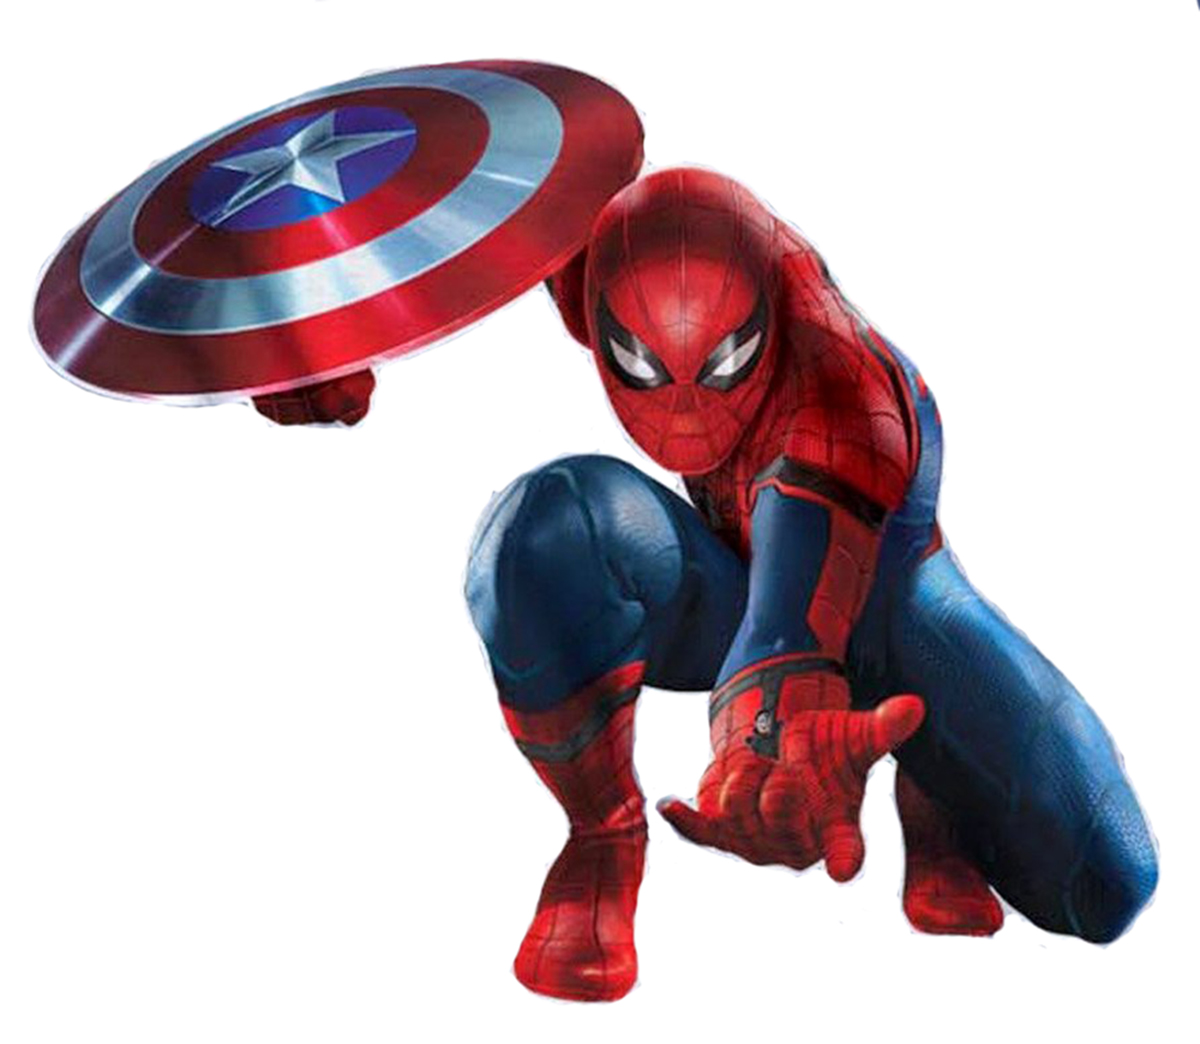 Captain America Civil War Concept Art Spiderman